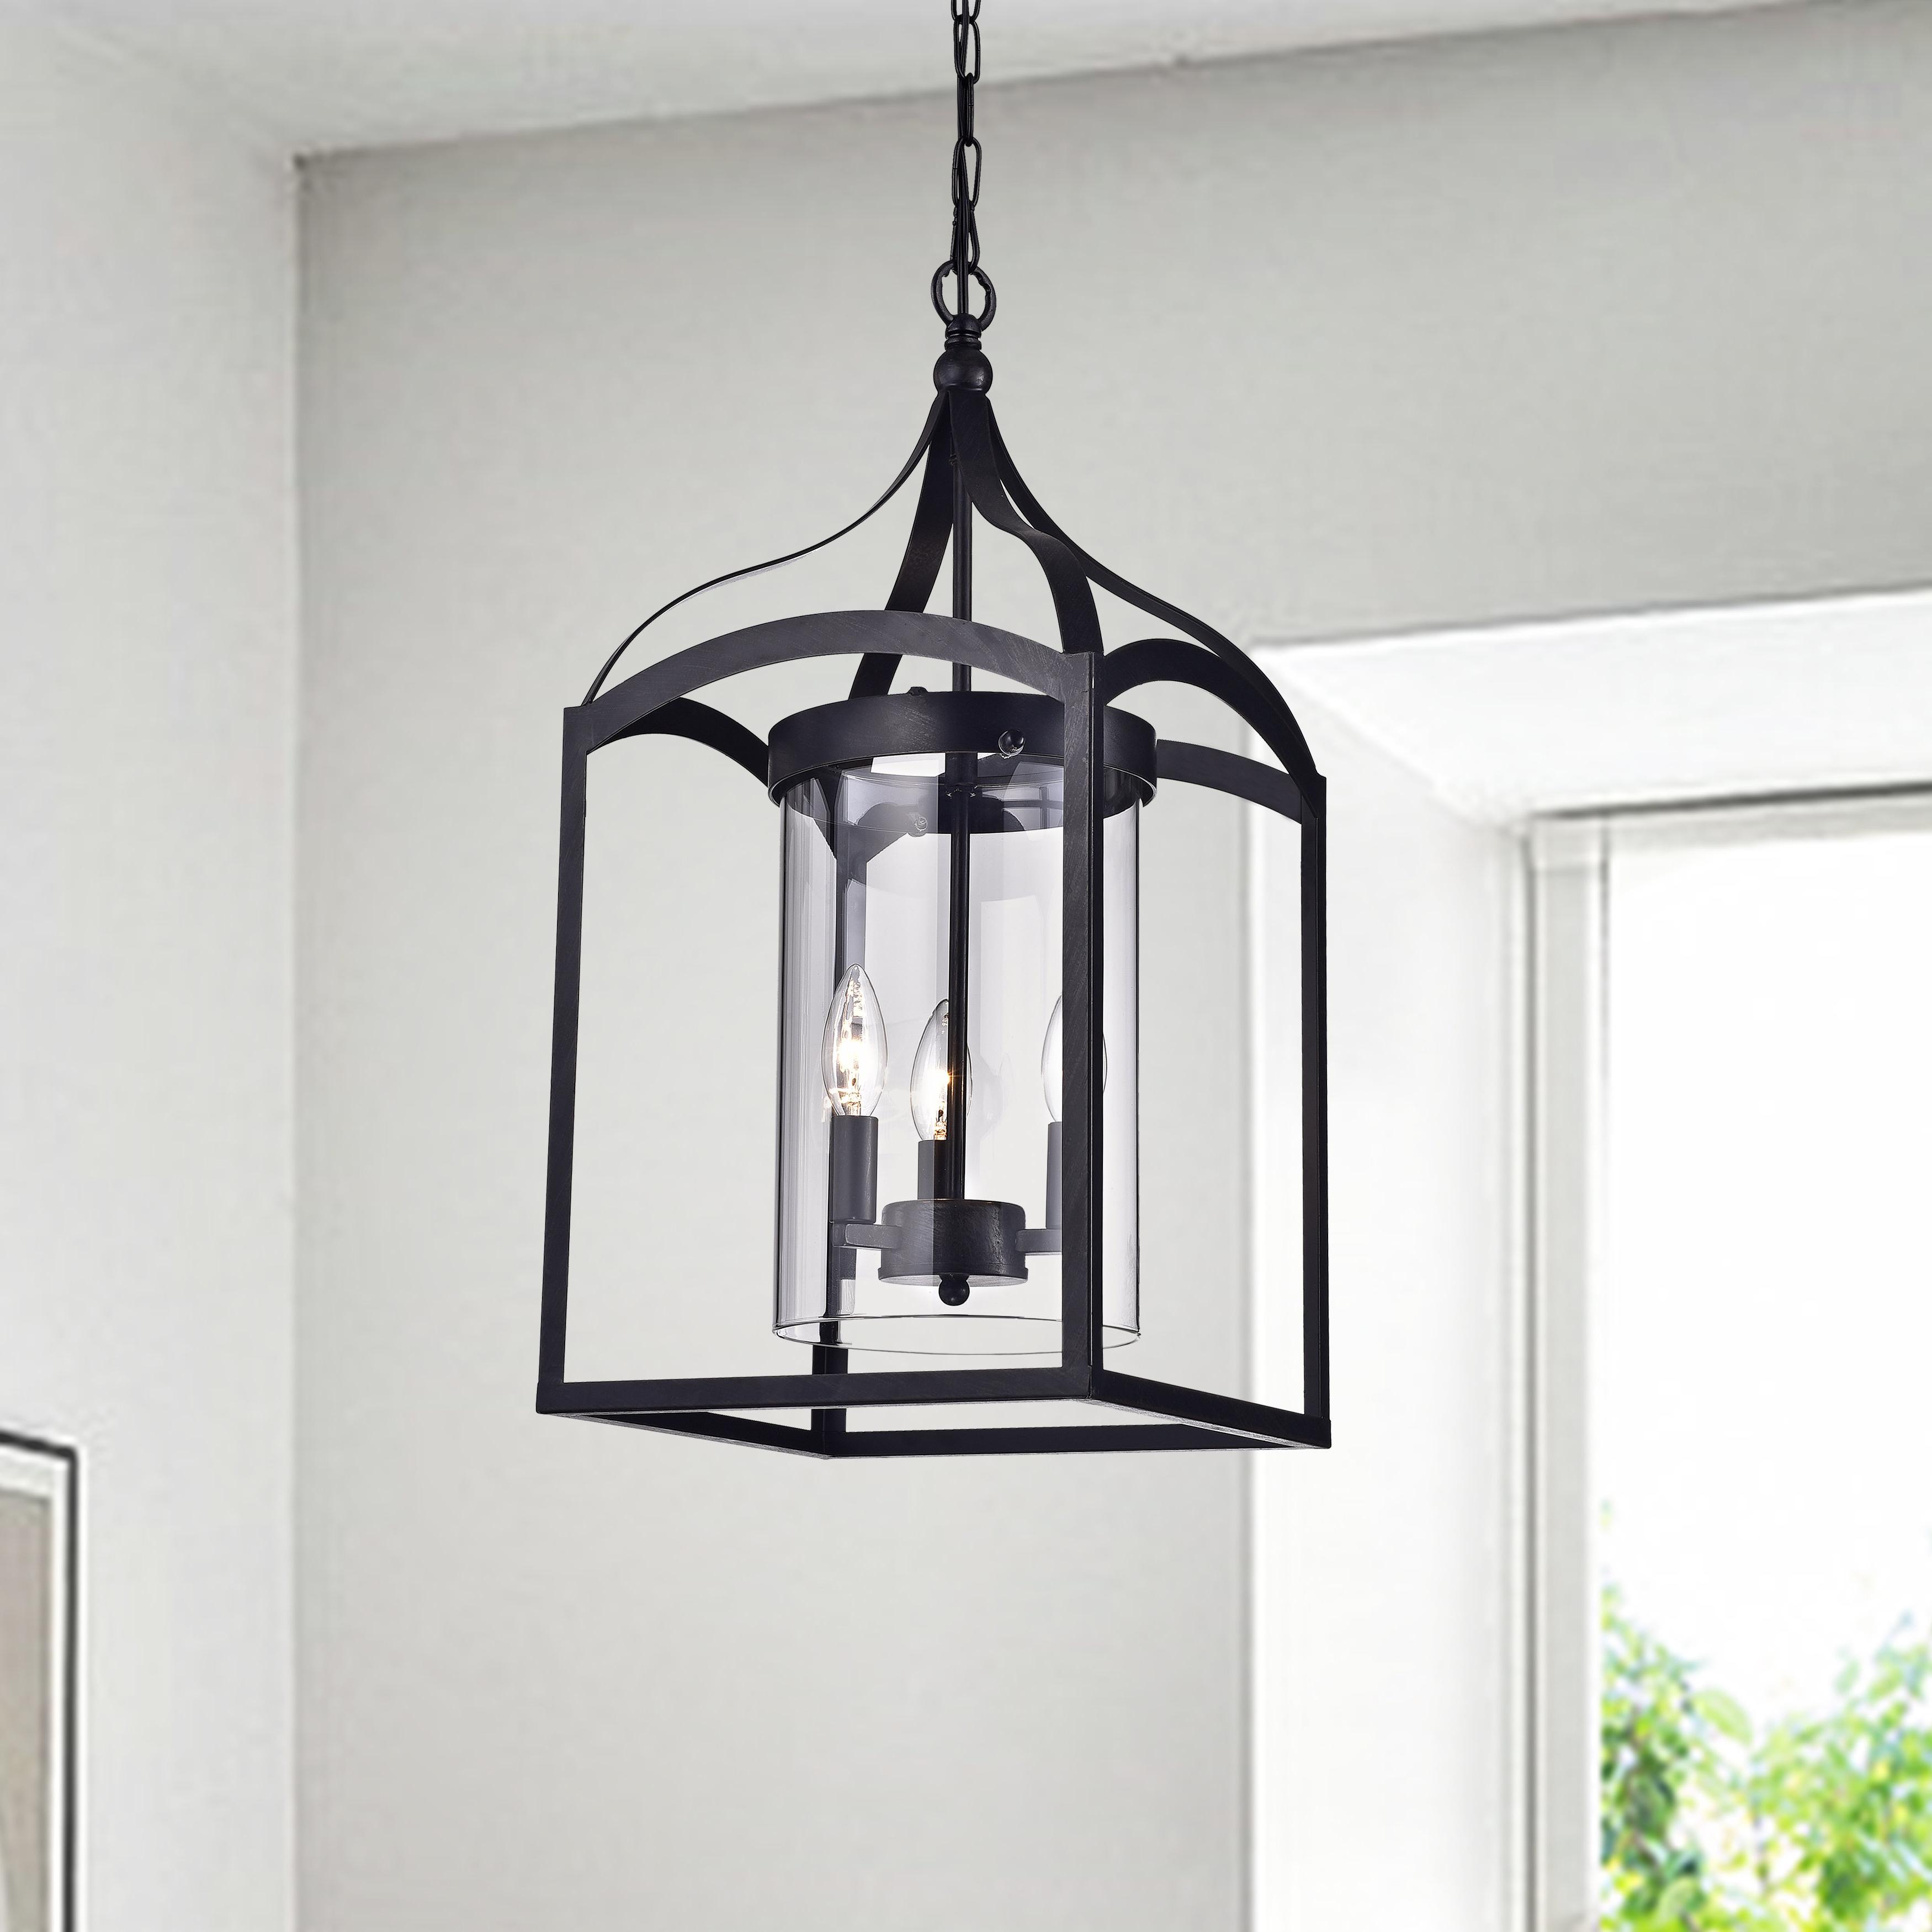 Widely Used Sherri Ann 3 Light Lantern Square / Rectangle Pendants Inside Ericsson 3 Light Lantern Square Pendant (Gallery 18 of 20)